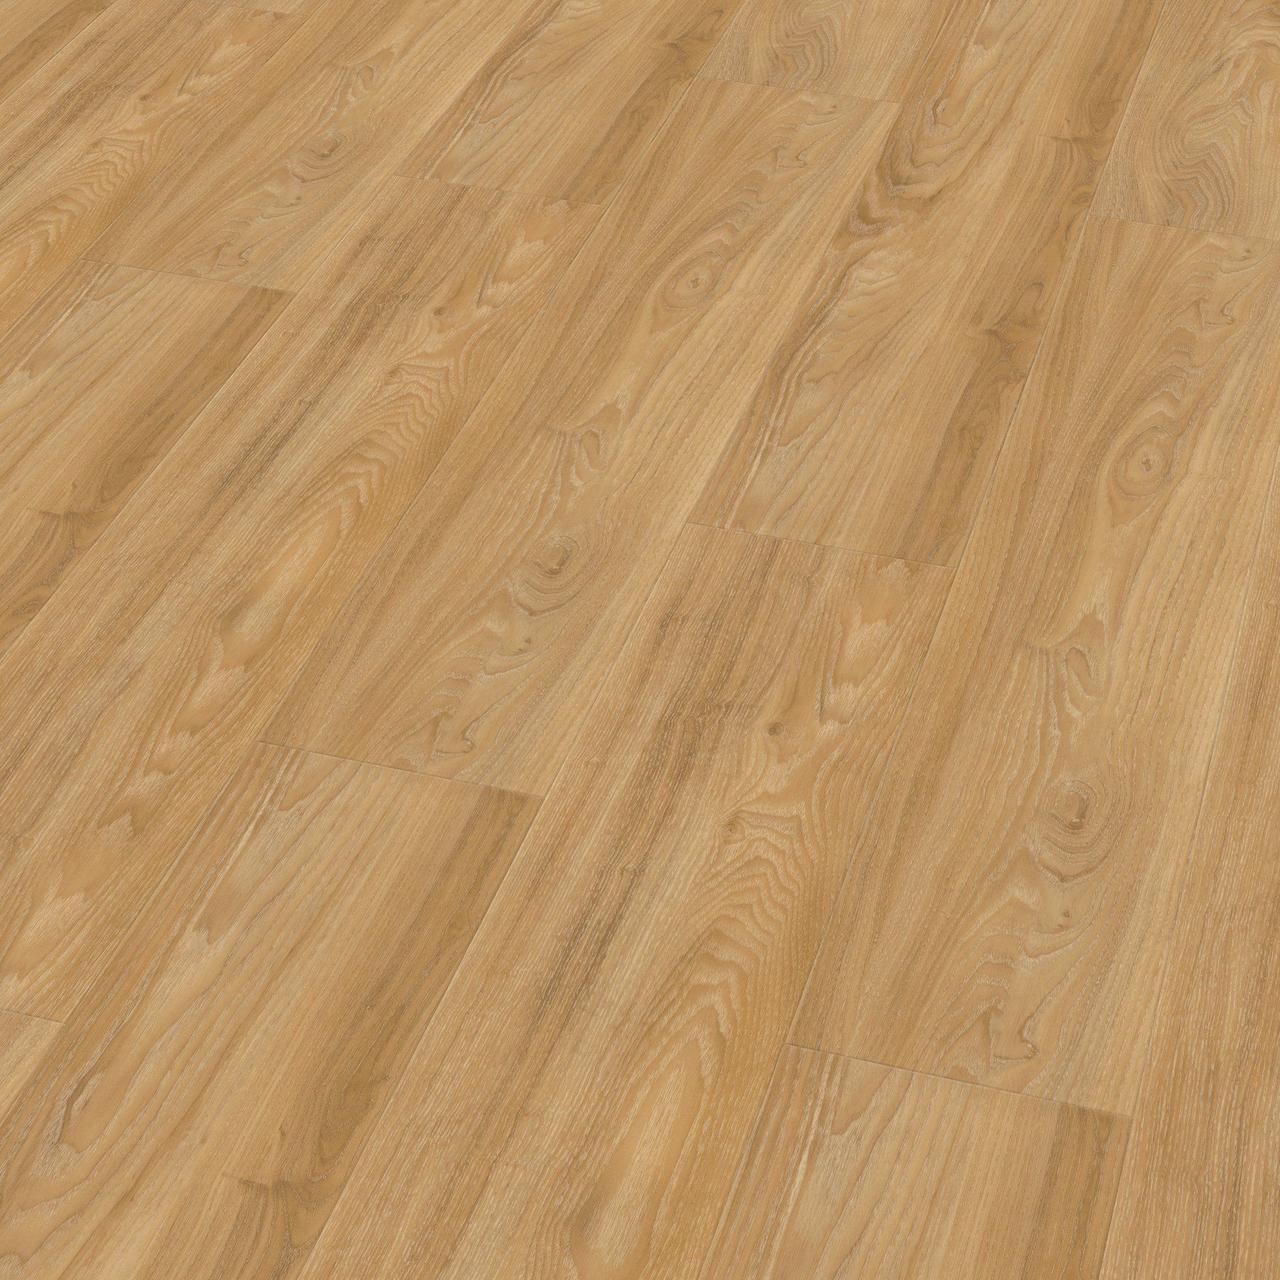 Вінілові покриття Wineo Summer Golden Oak